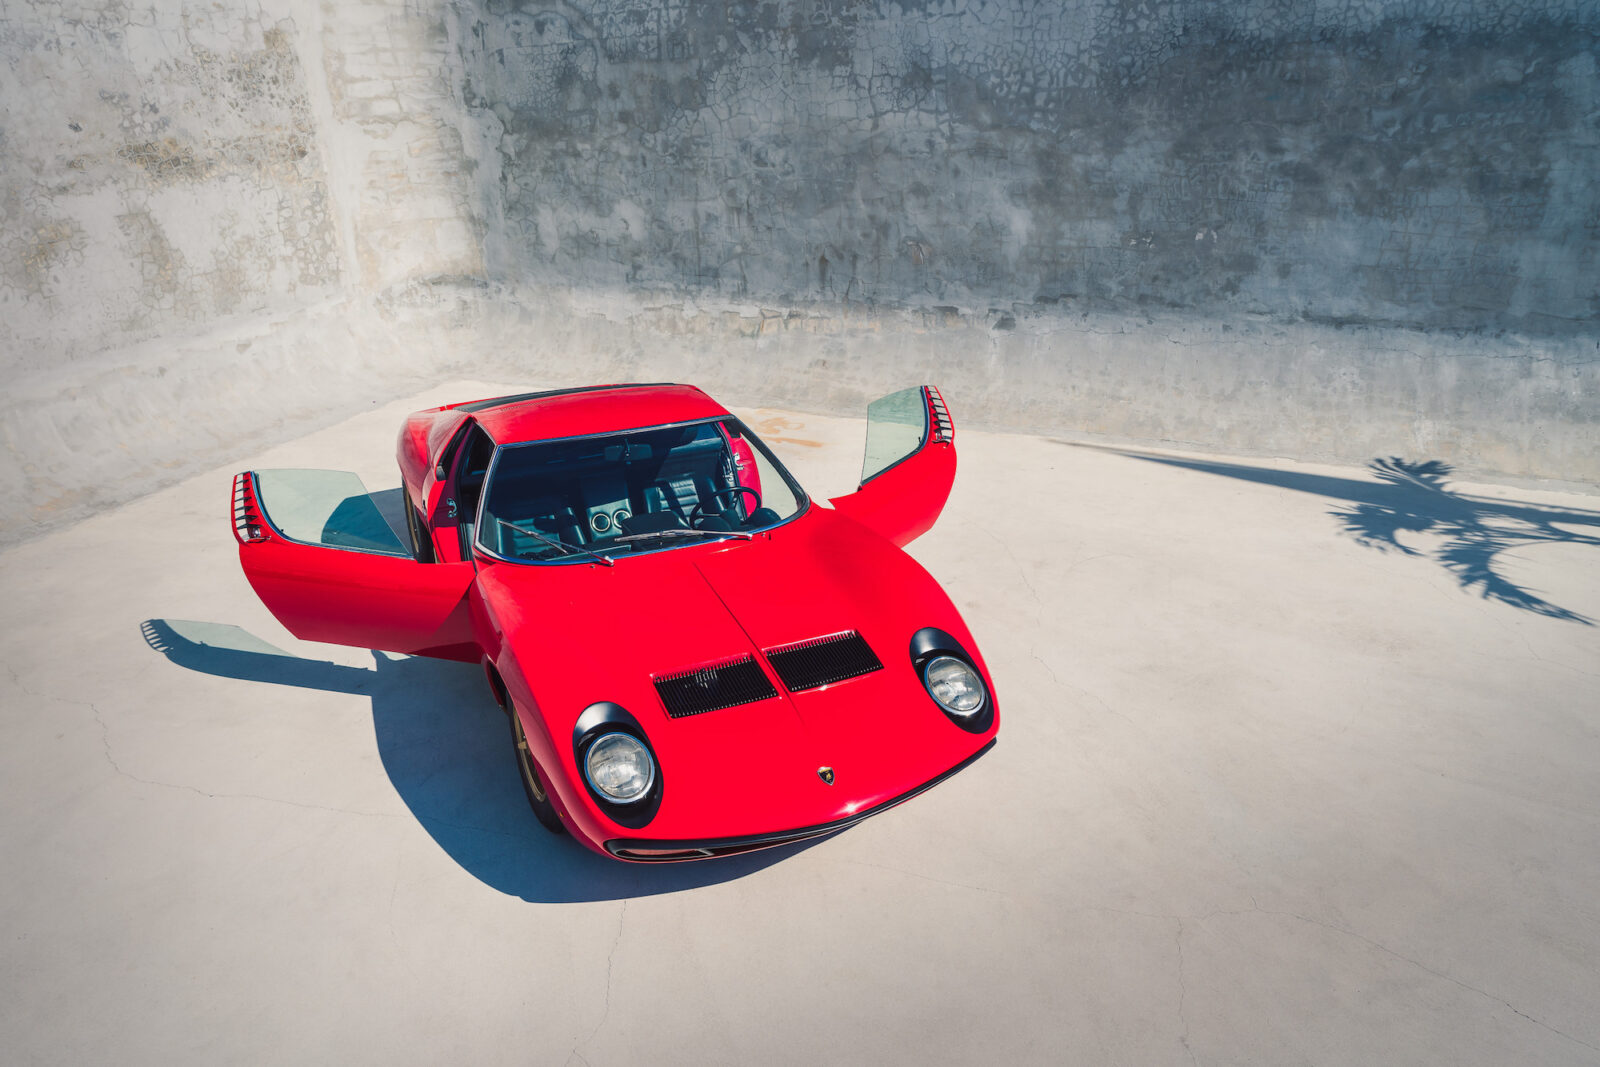 Lamborghini Miura SV 2 1600x1067 - 1972 Lamborghini Miura SV